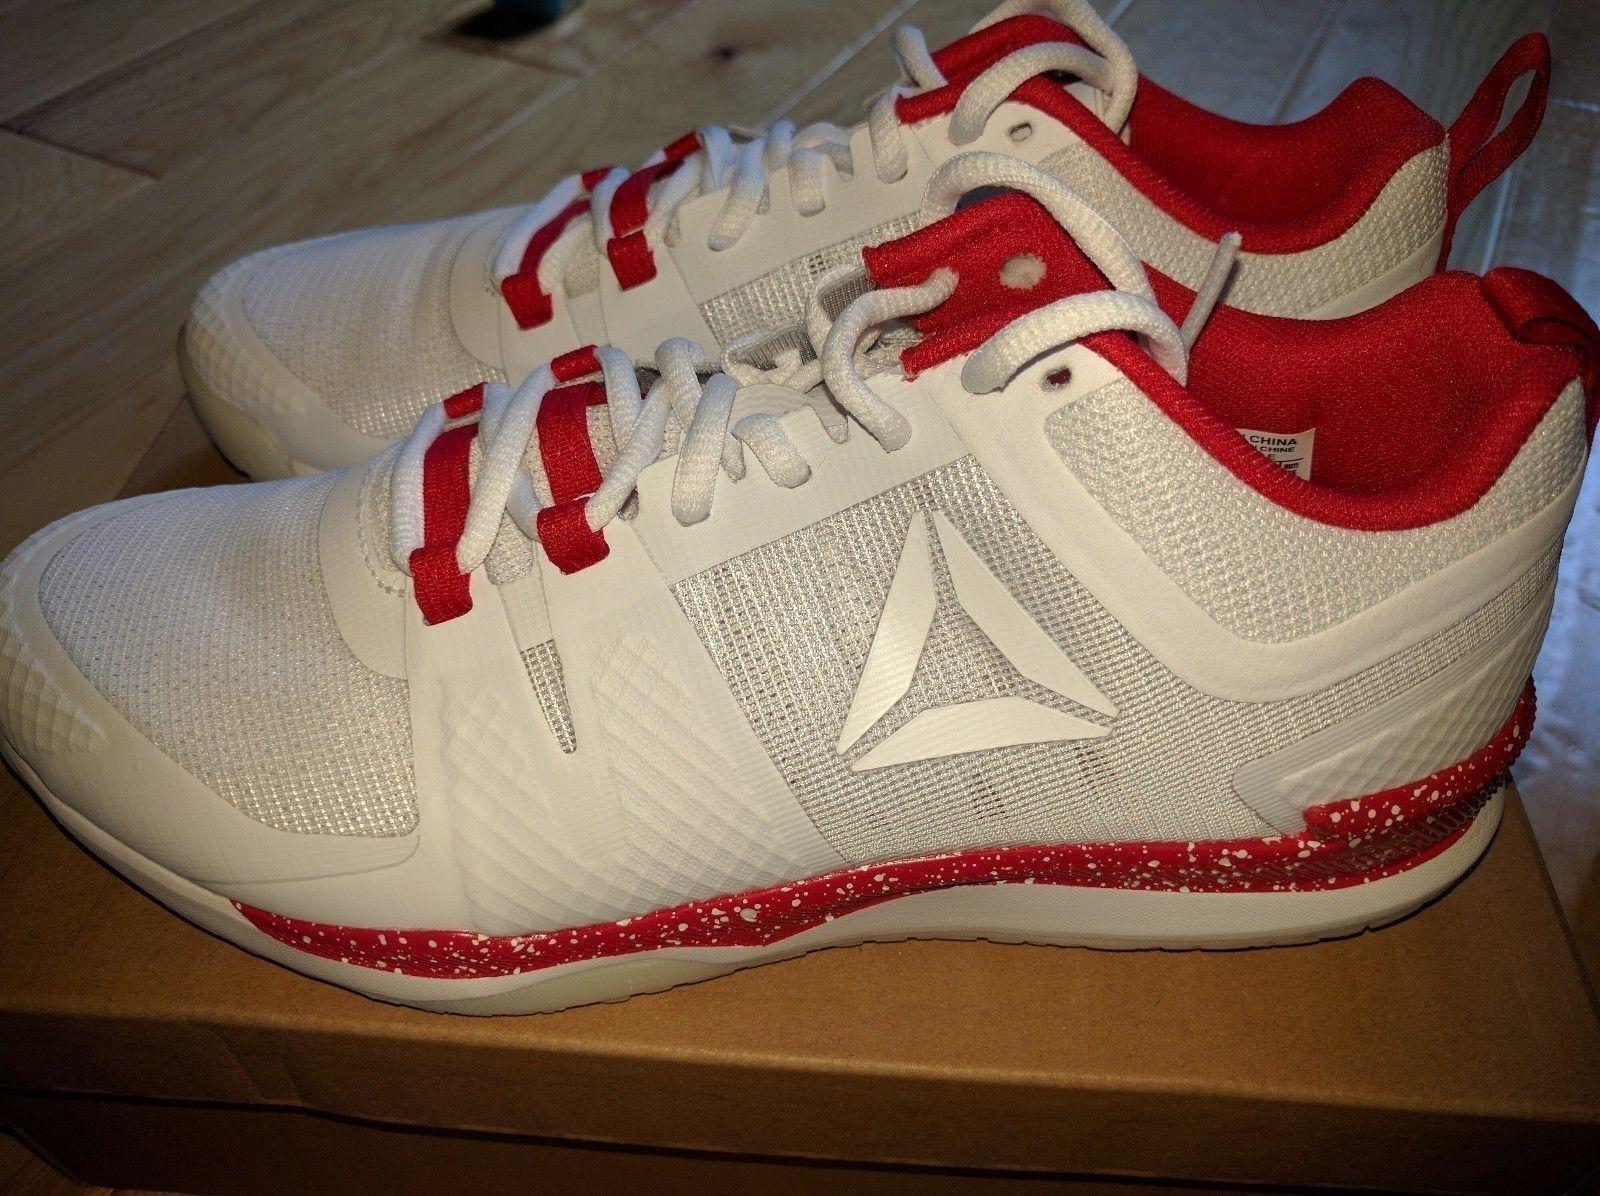 Reebok JJ Watt 1 Training Shoes White Red Skull Grey BD4837 Houston Texans NEW